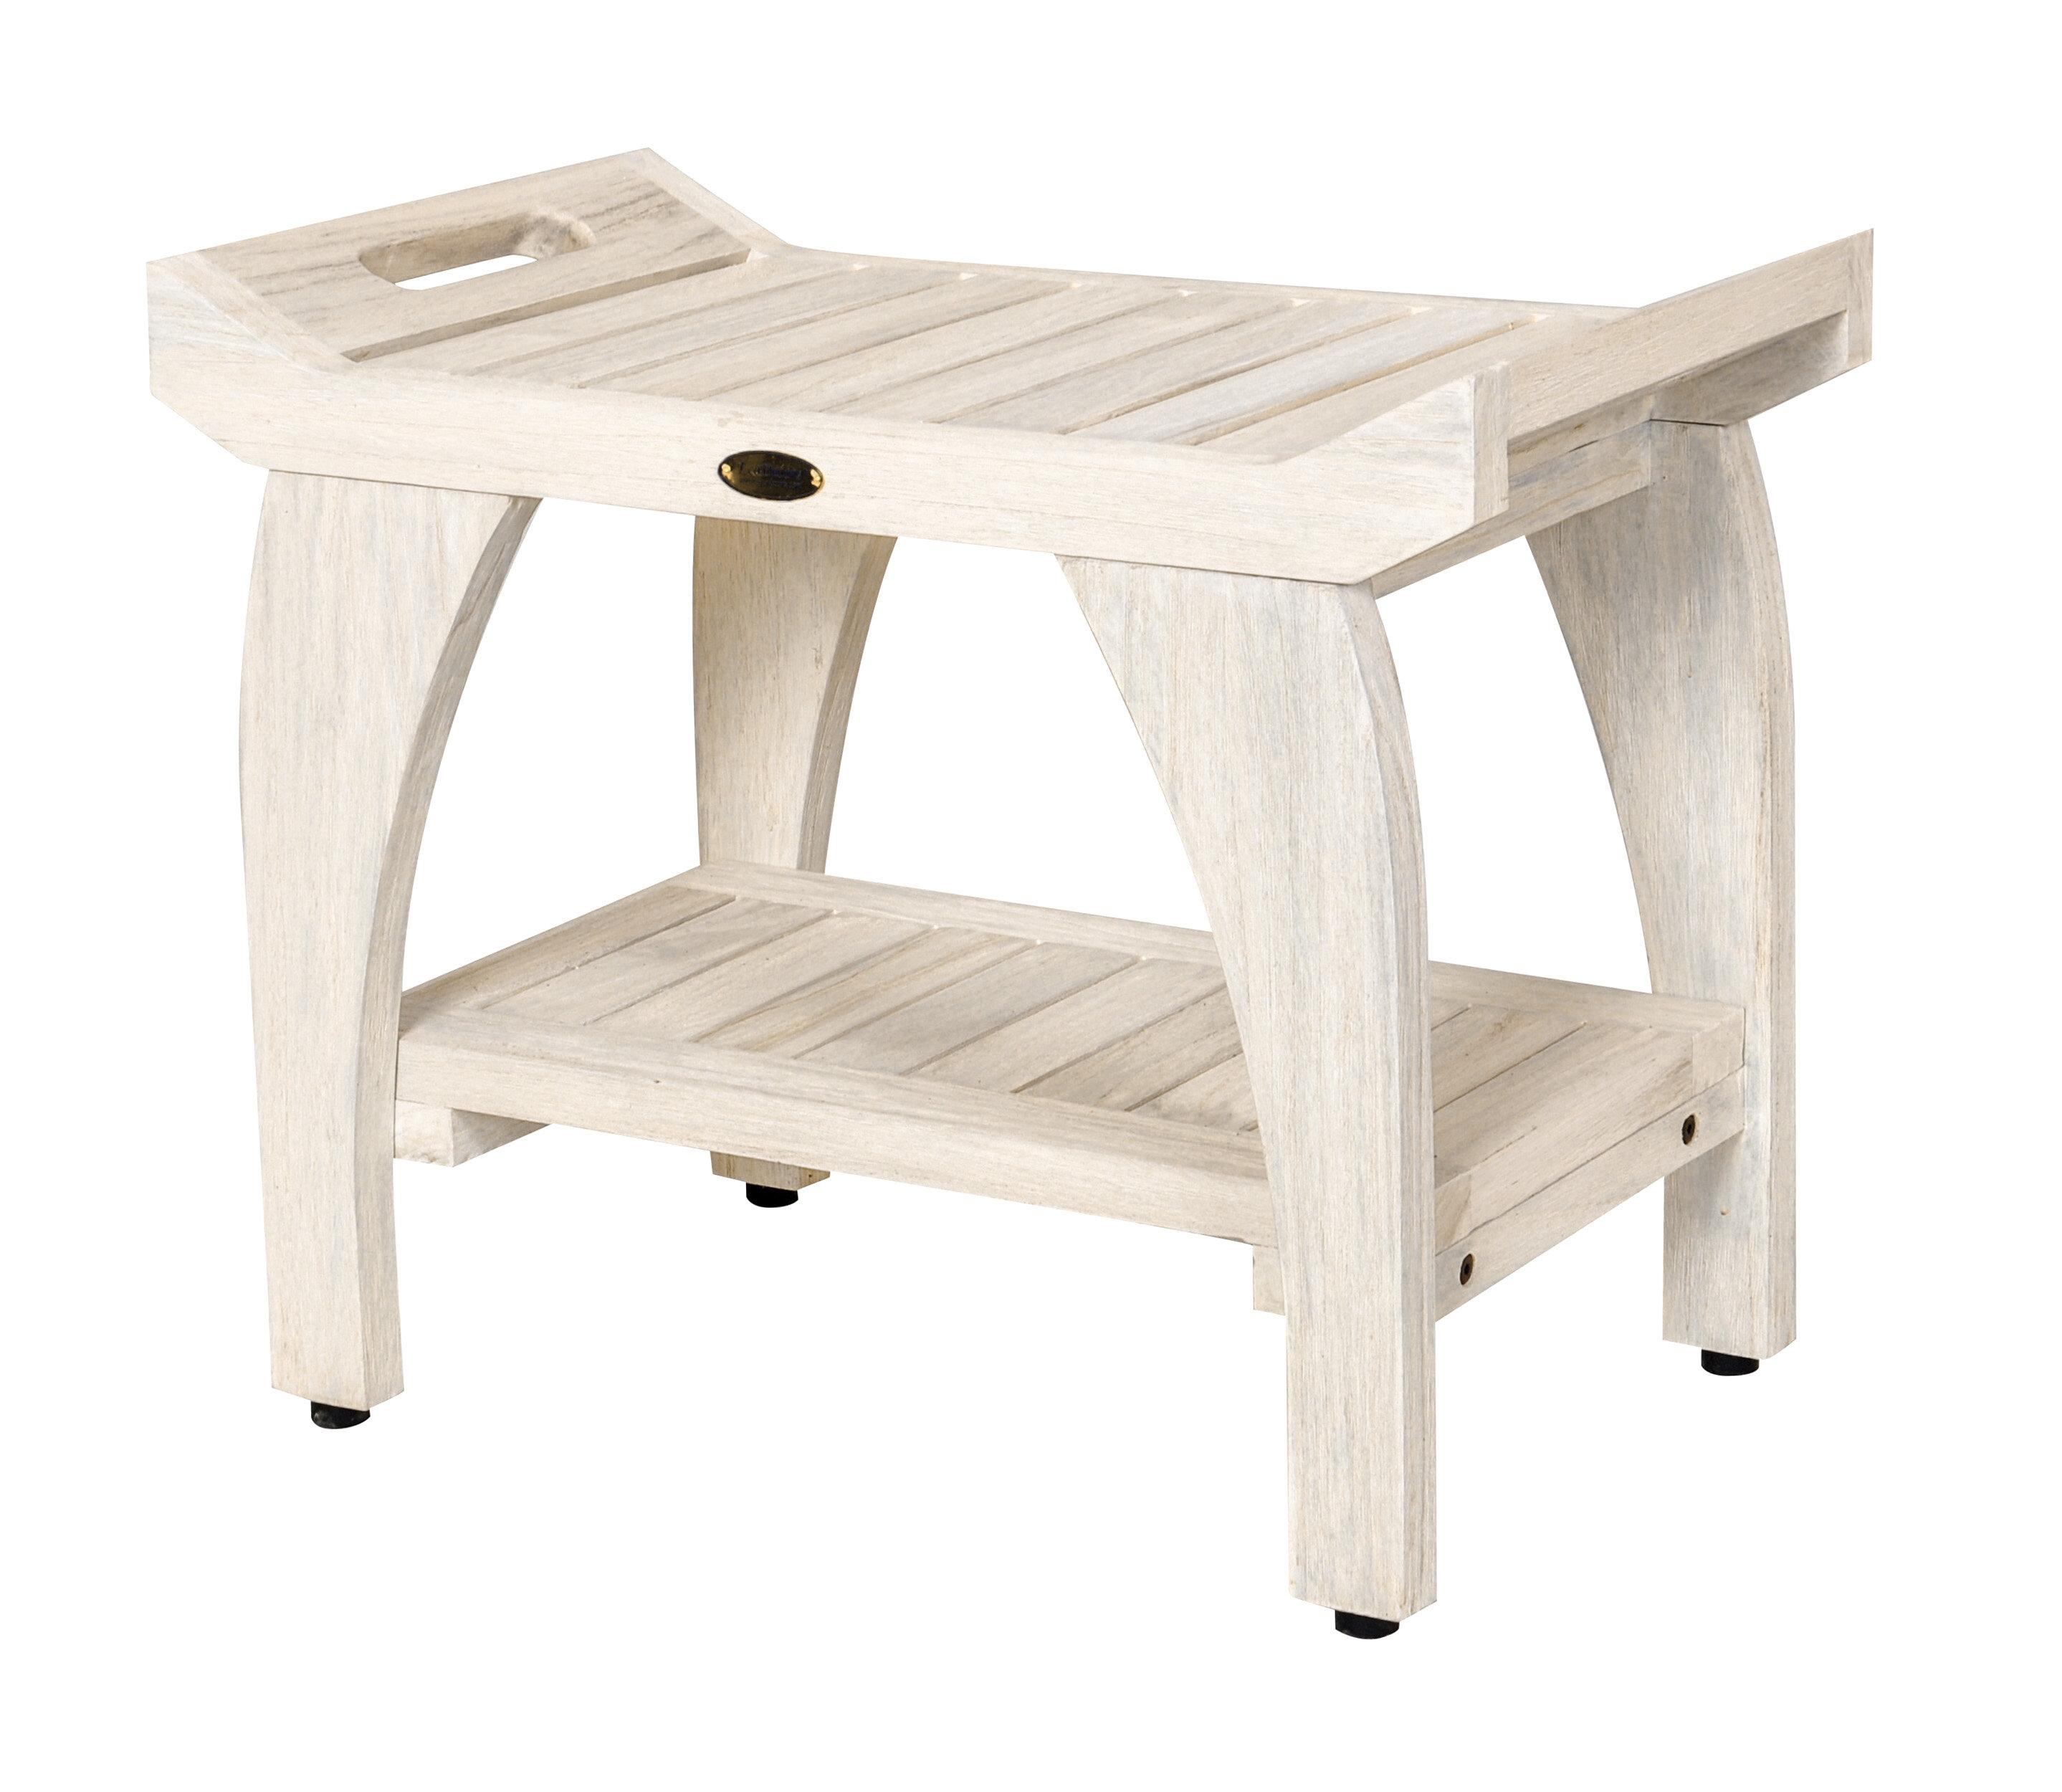 Ecodecors Tranquility Coastal Vogue 24 Teak Shower Bench With Shelf Reviews Wayfair